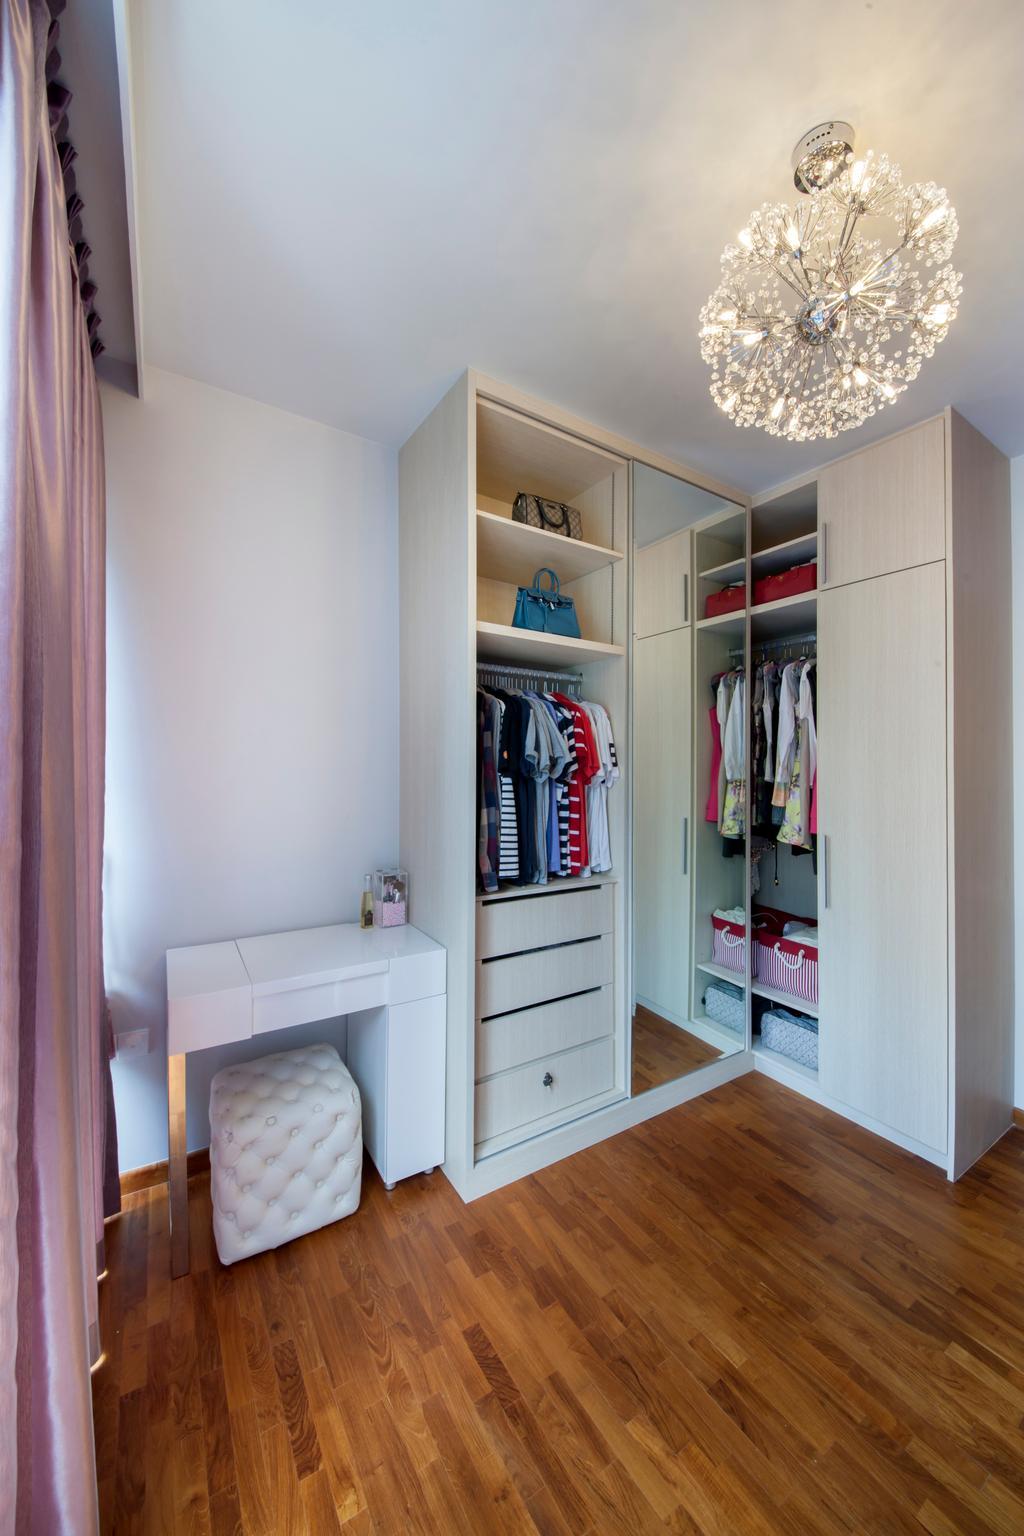 Modern, Condo, Bedroom, The Tampines Trilliant, Interior Designer, Edge Interior, Chandelier, Crystal Lights, Wardrobe, Wood Floor, Wooden Flooring, Clothes, Dressing Table, White Wardrobe, Ottoman